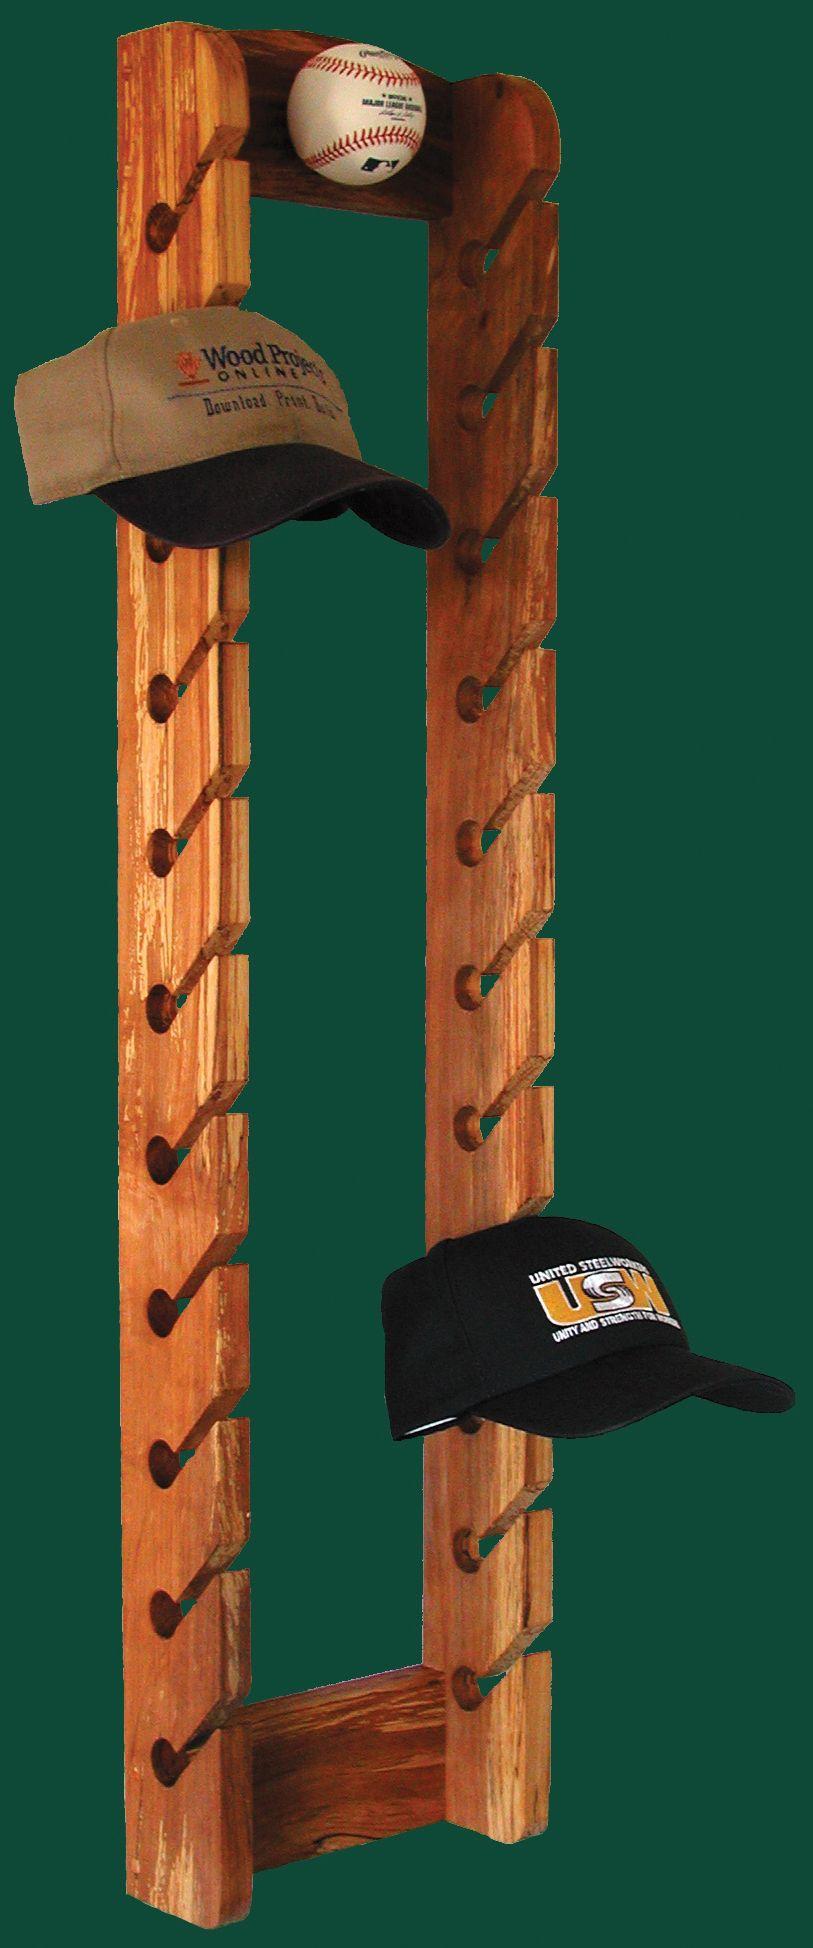 9 Diy Hat Rack Ideas For Any Home Diy Hat Rack Diy Wood